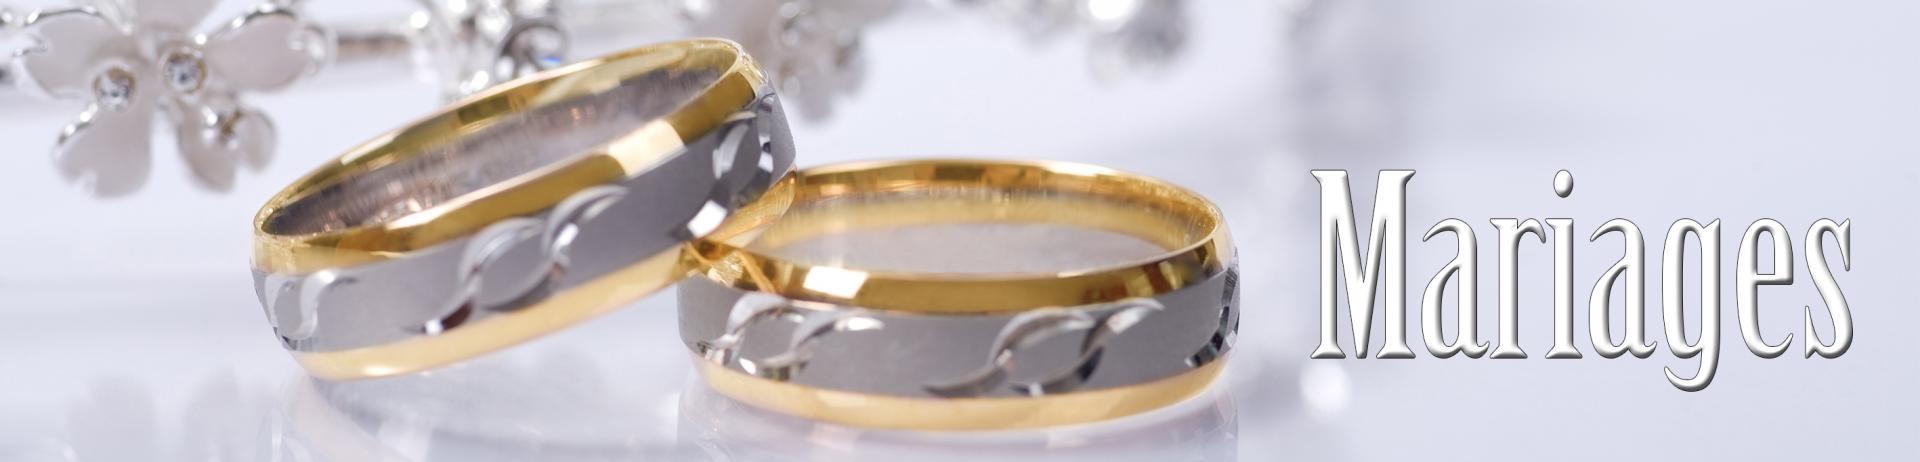 Bandeau mariage